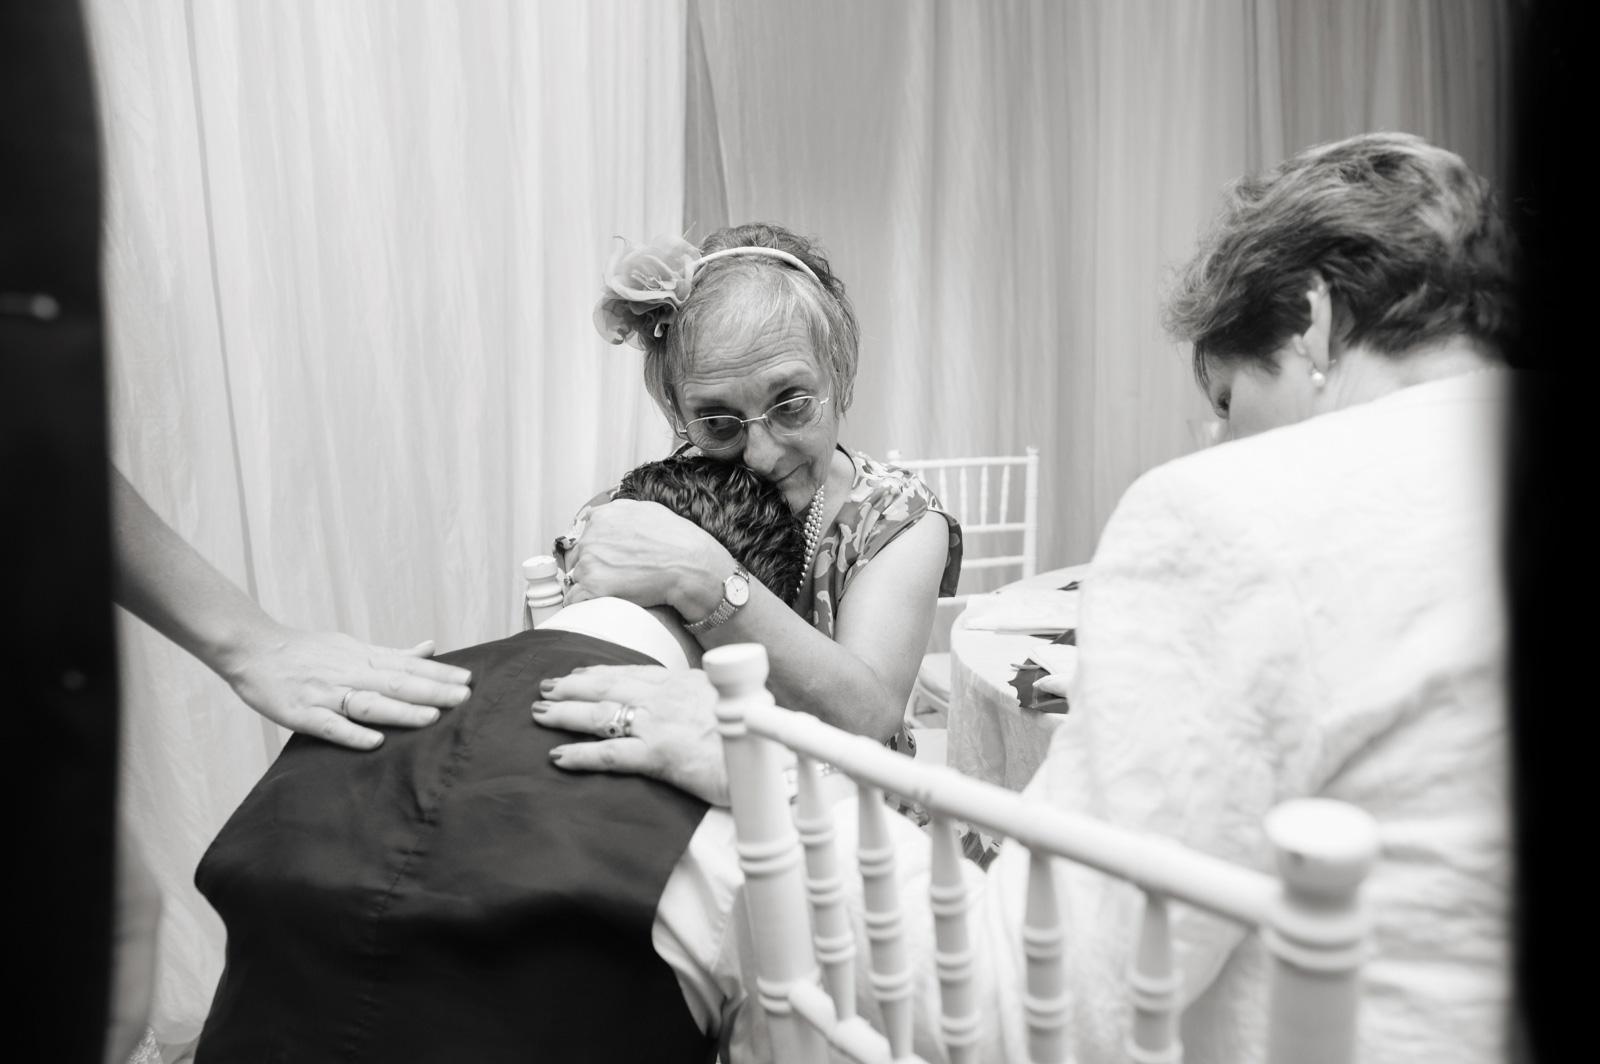 gran hugging groom